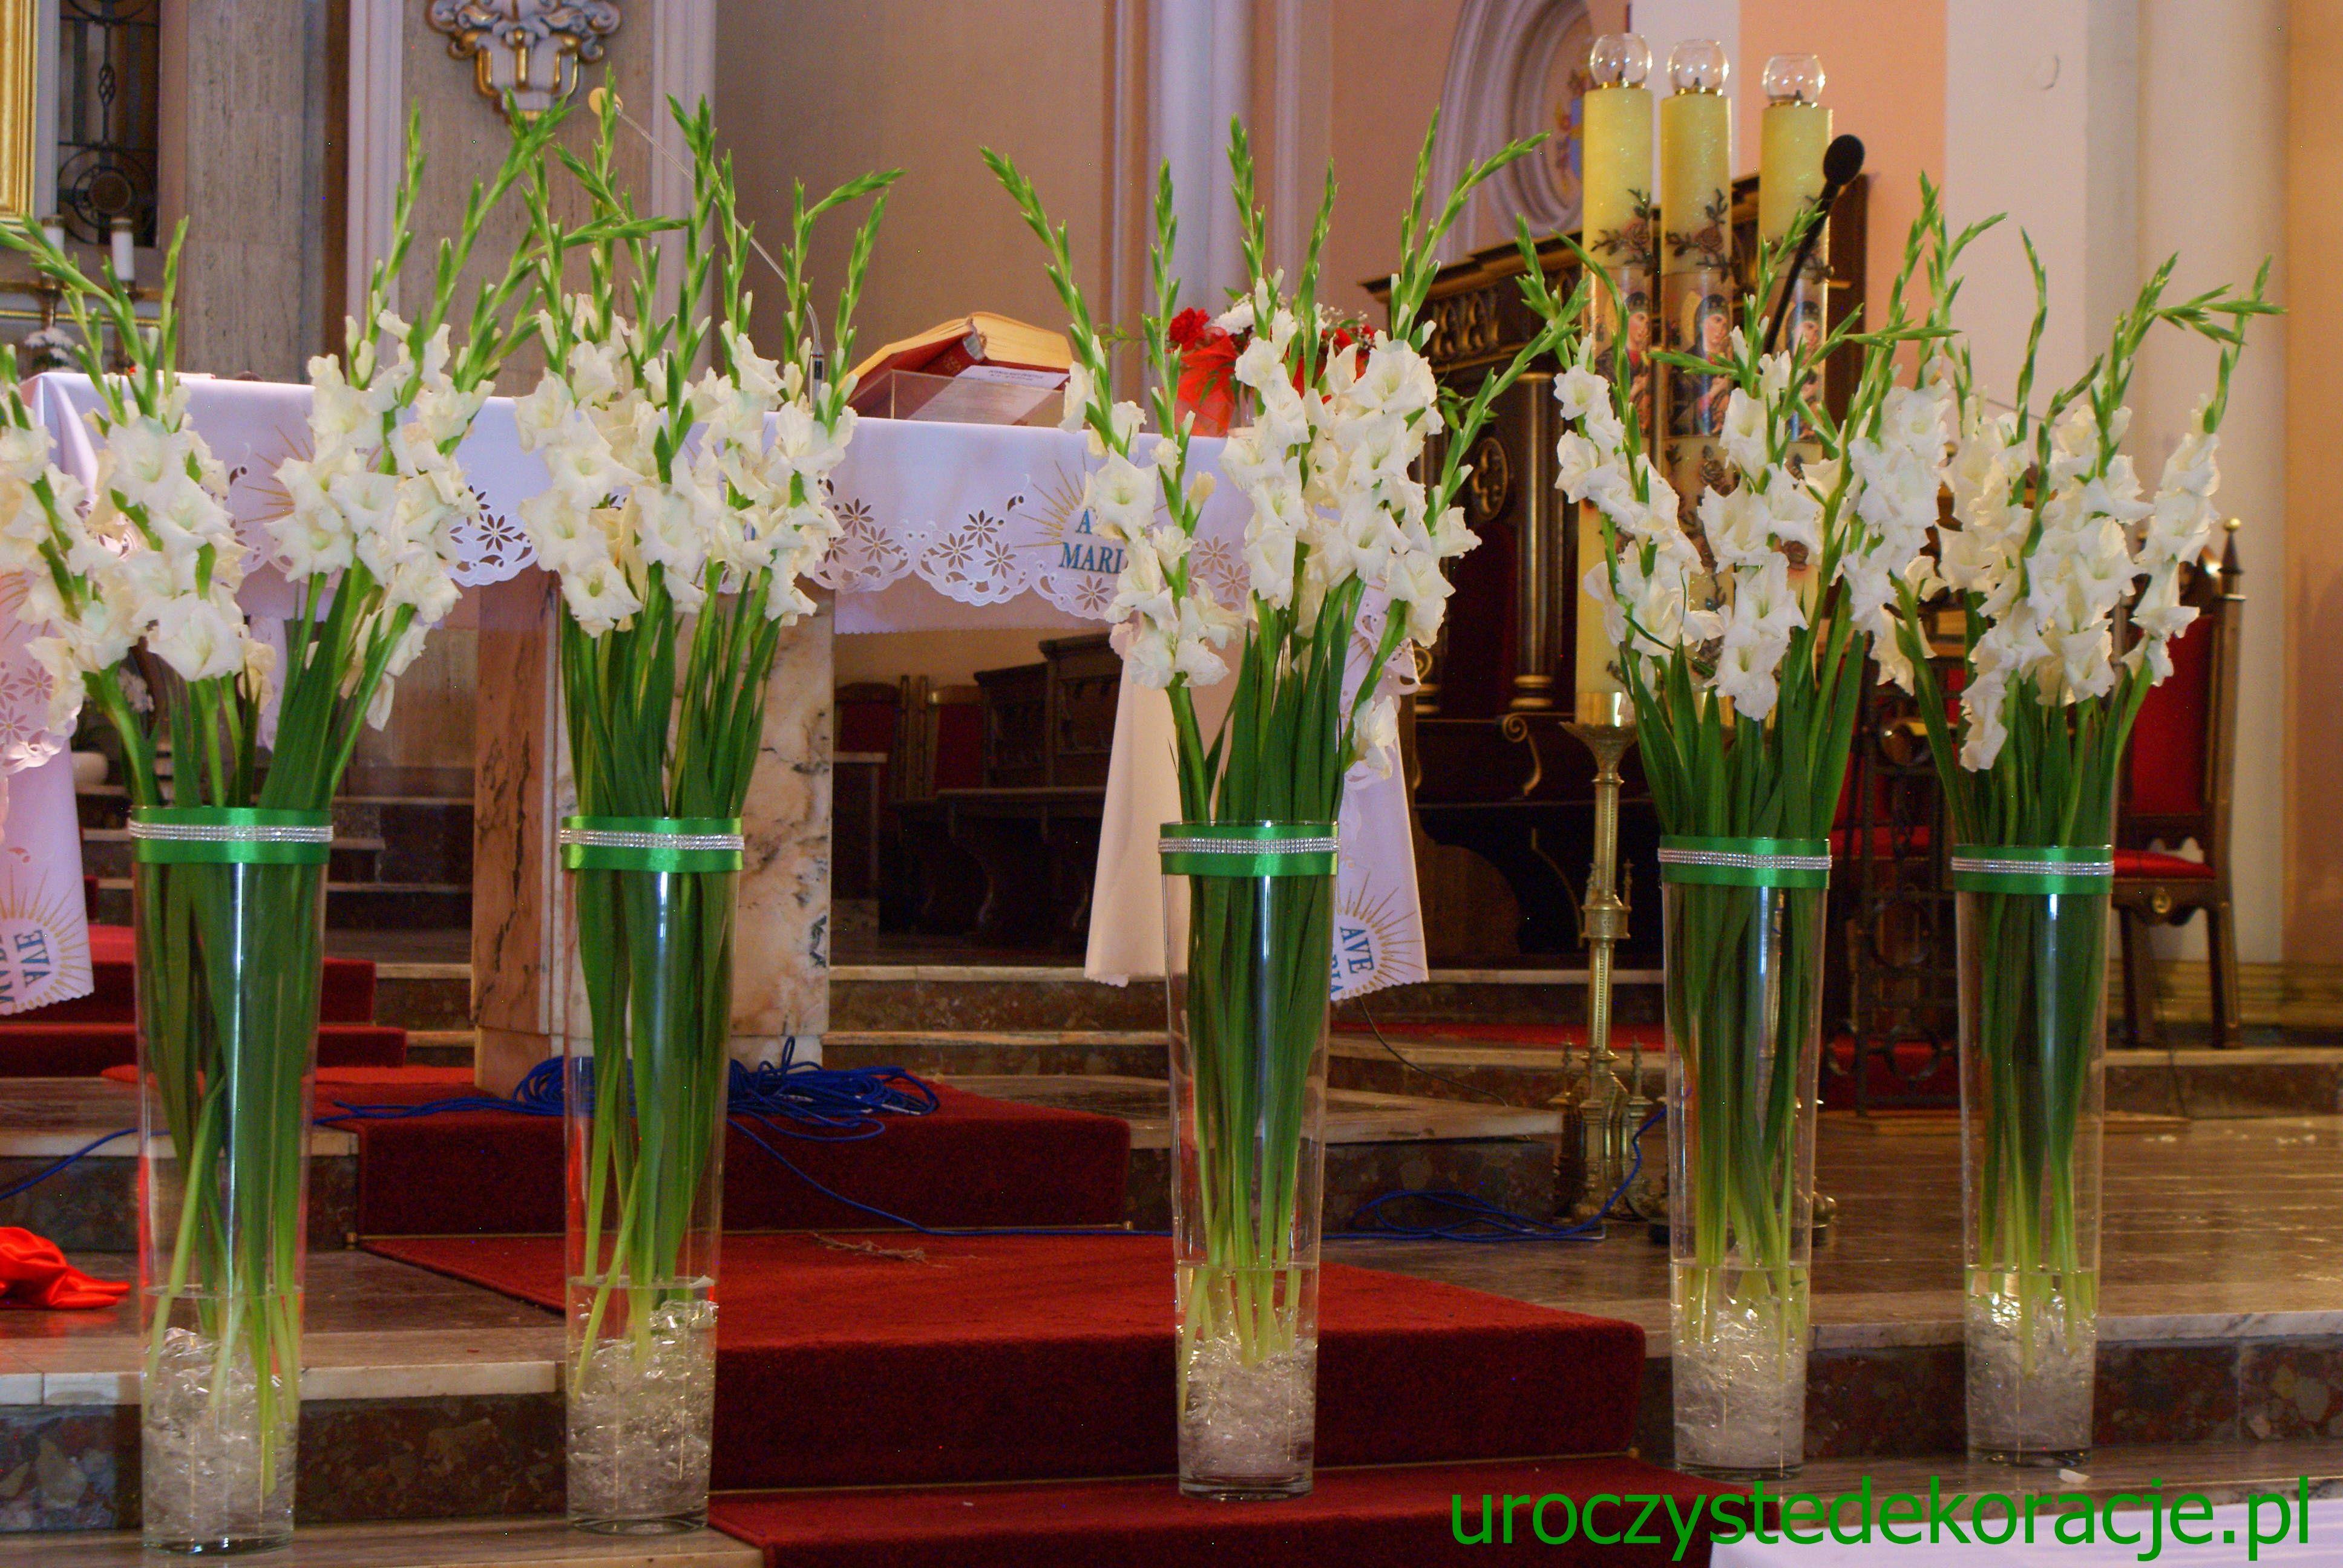 Dekoracje Oltarzy Na Slub Wedding Centerpieces Diy Church Decor Church Wedding Decorations